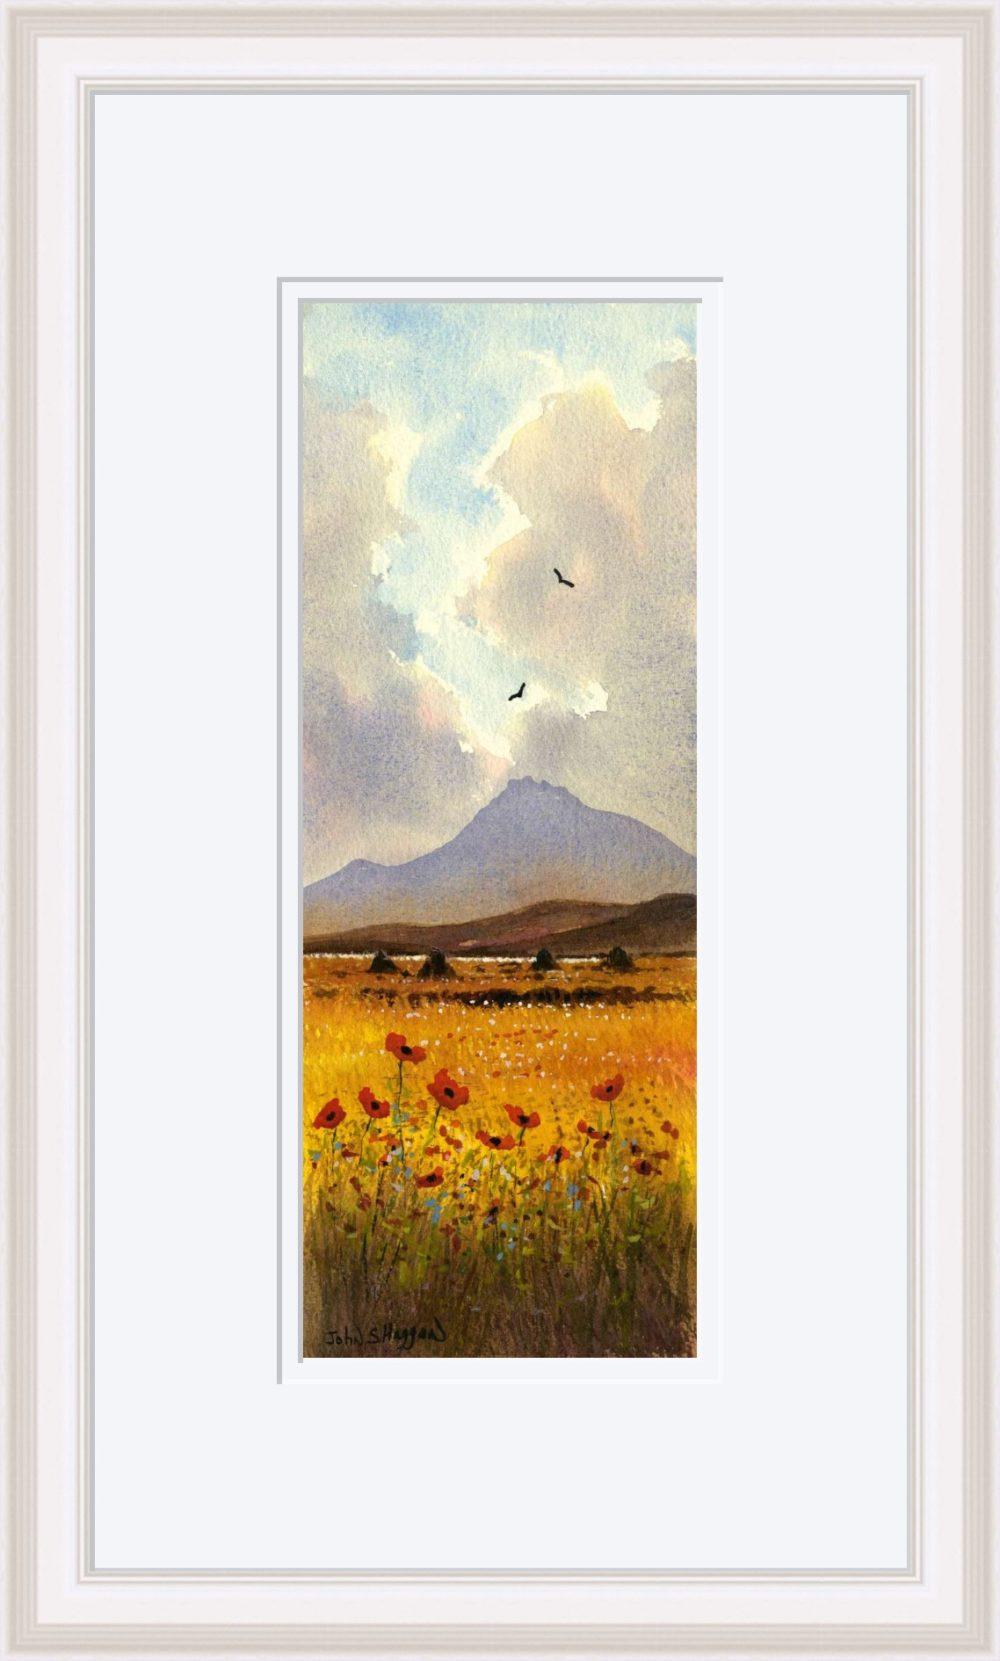 Connemara Poppies Print in White Frame